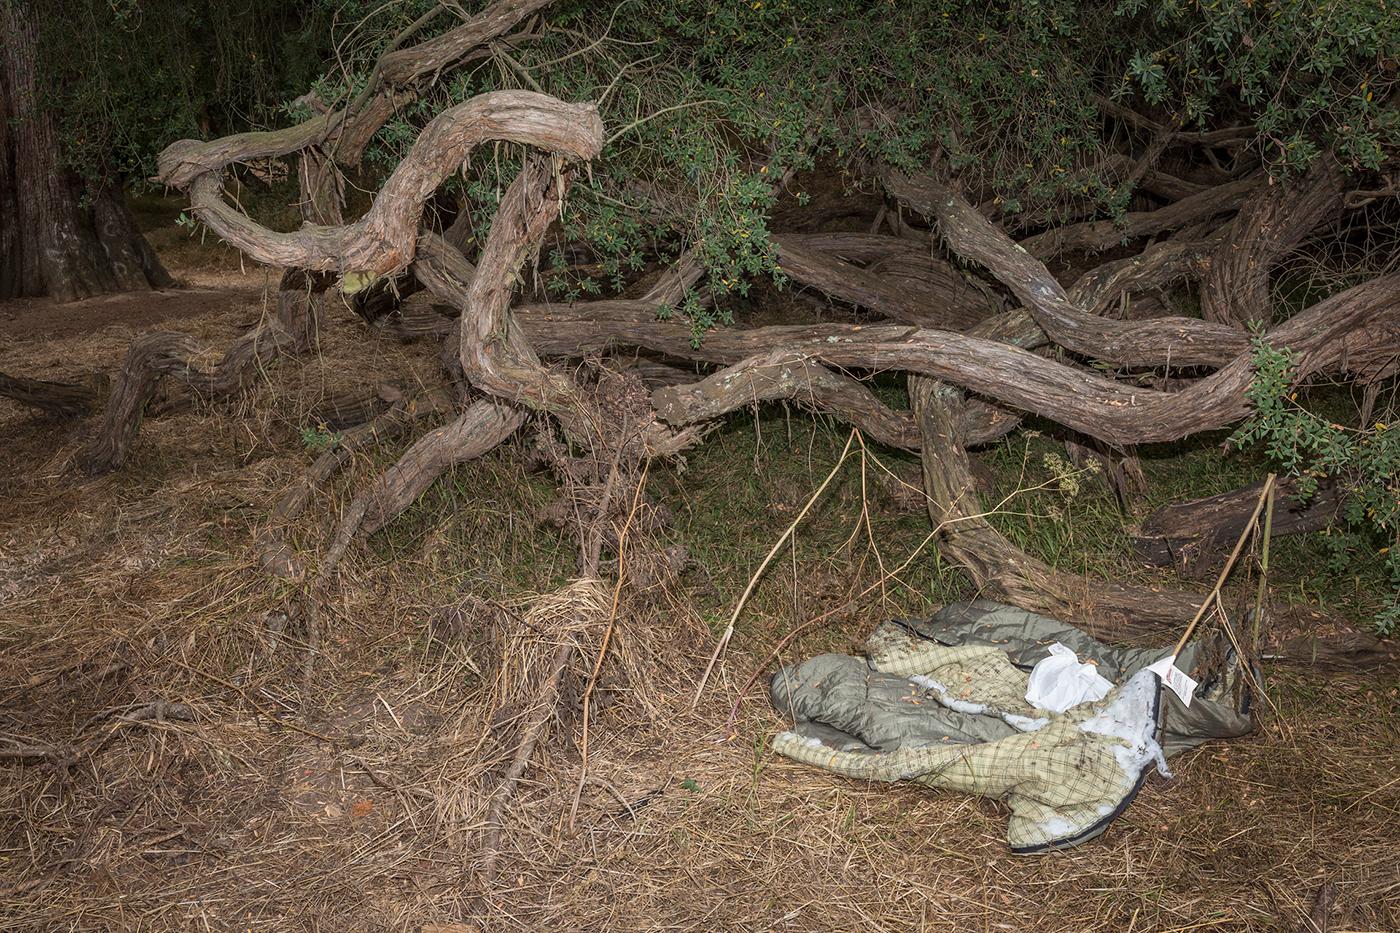 CeciliaBorgenstam_US_HereNotHere_TreeDeadGrassSleepingBag_12.jpg